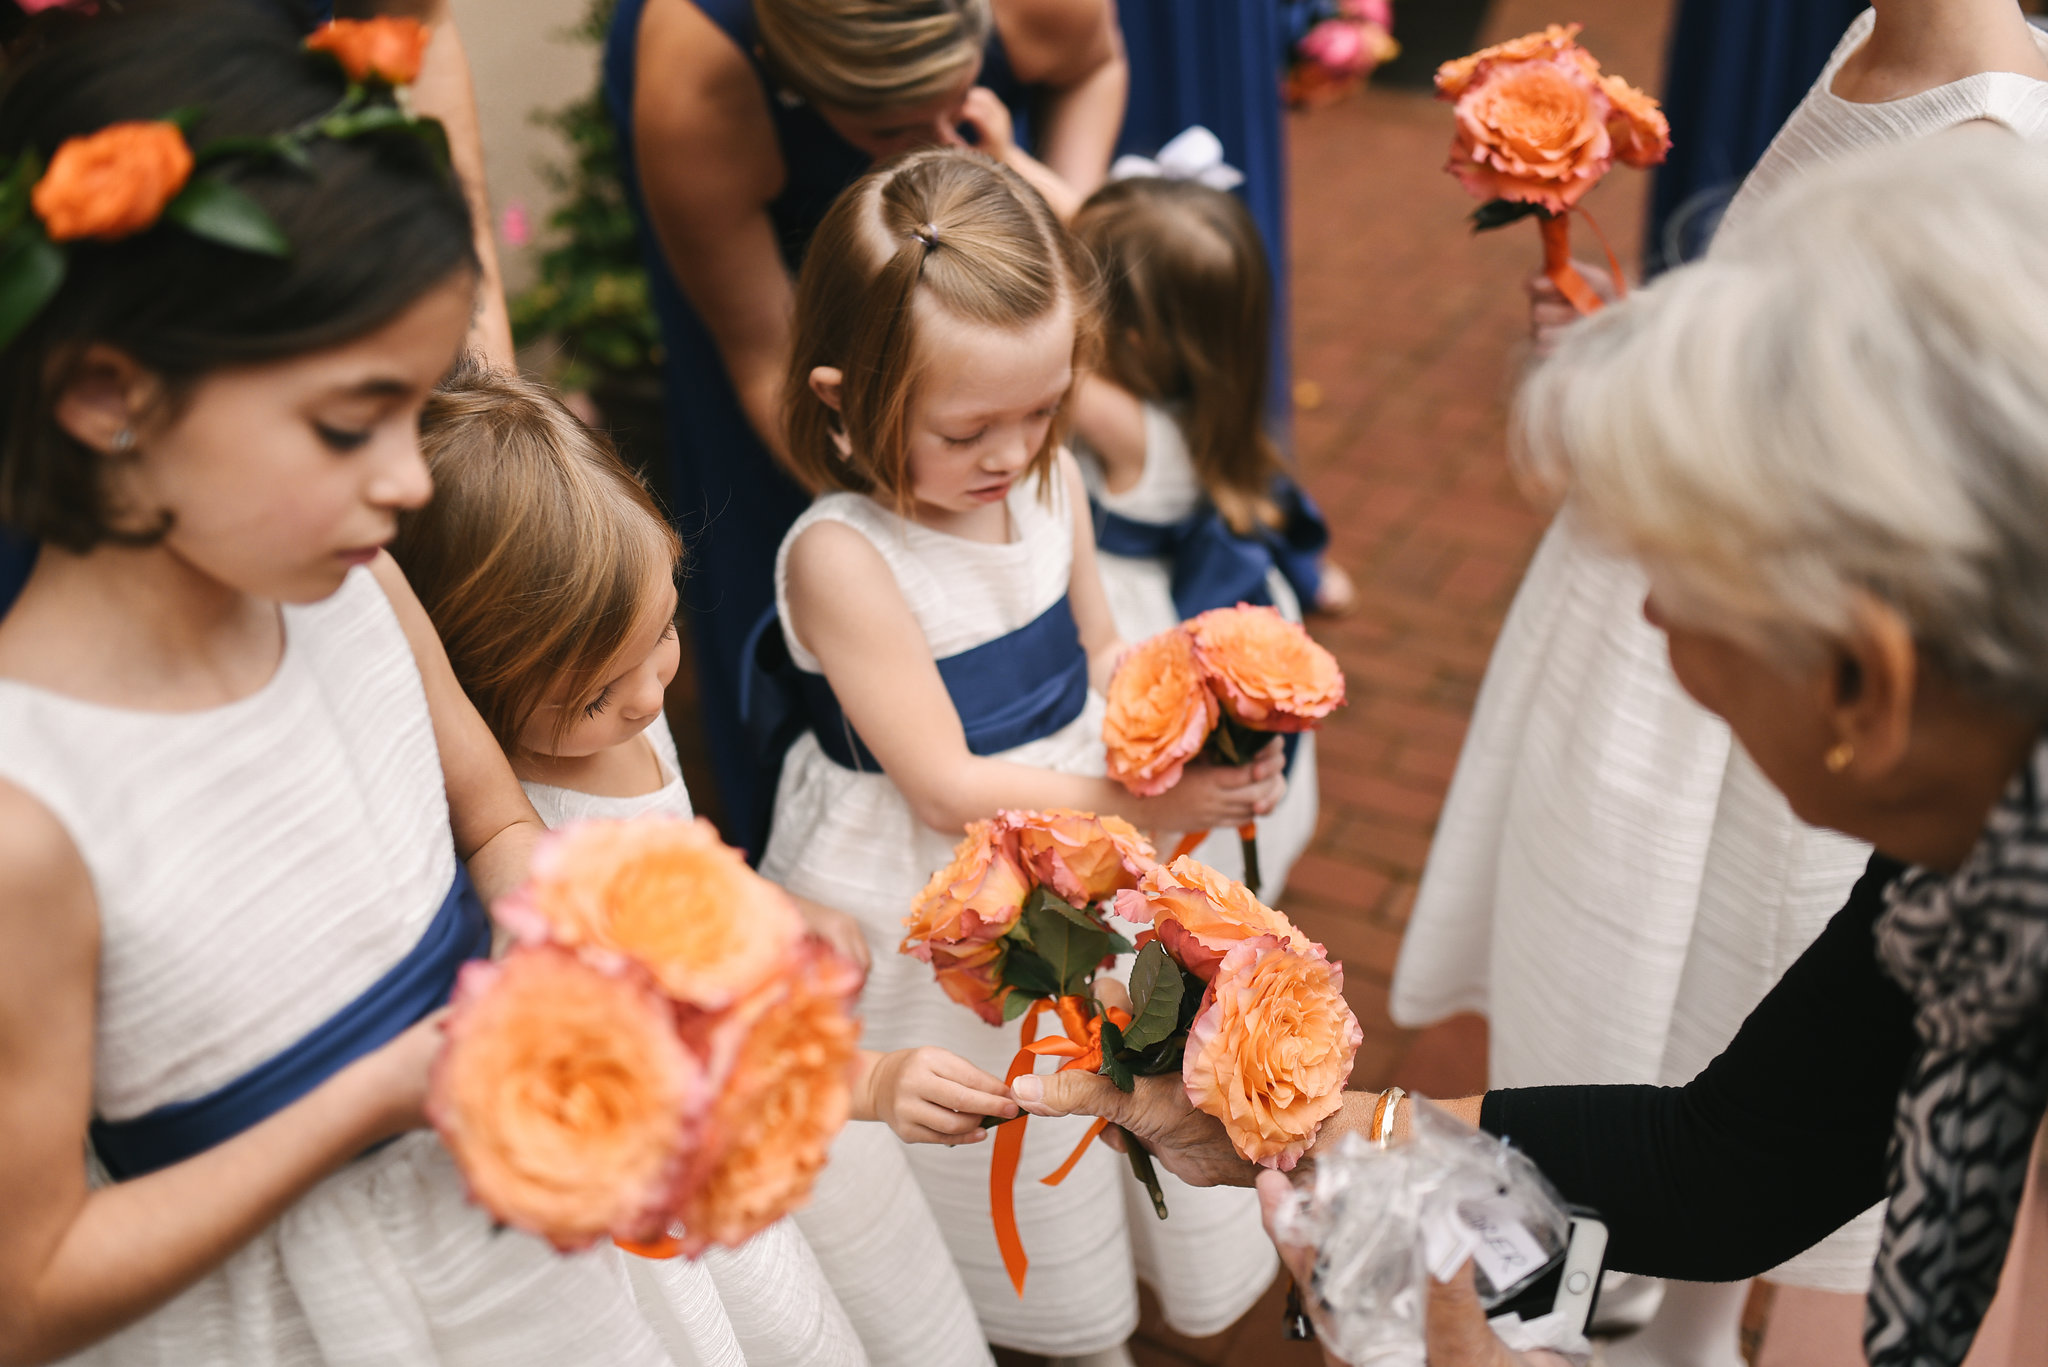 Alexandria, Fall Wedding, Historic, The Enchanted Florist, Wedding Party, Bridal Party, Flower Girls